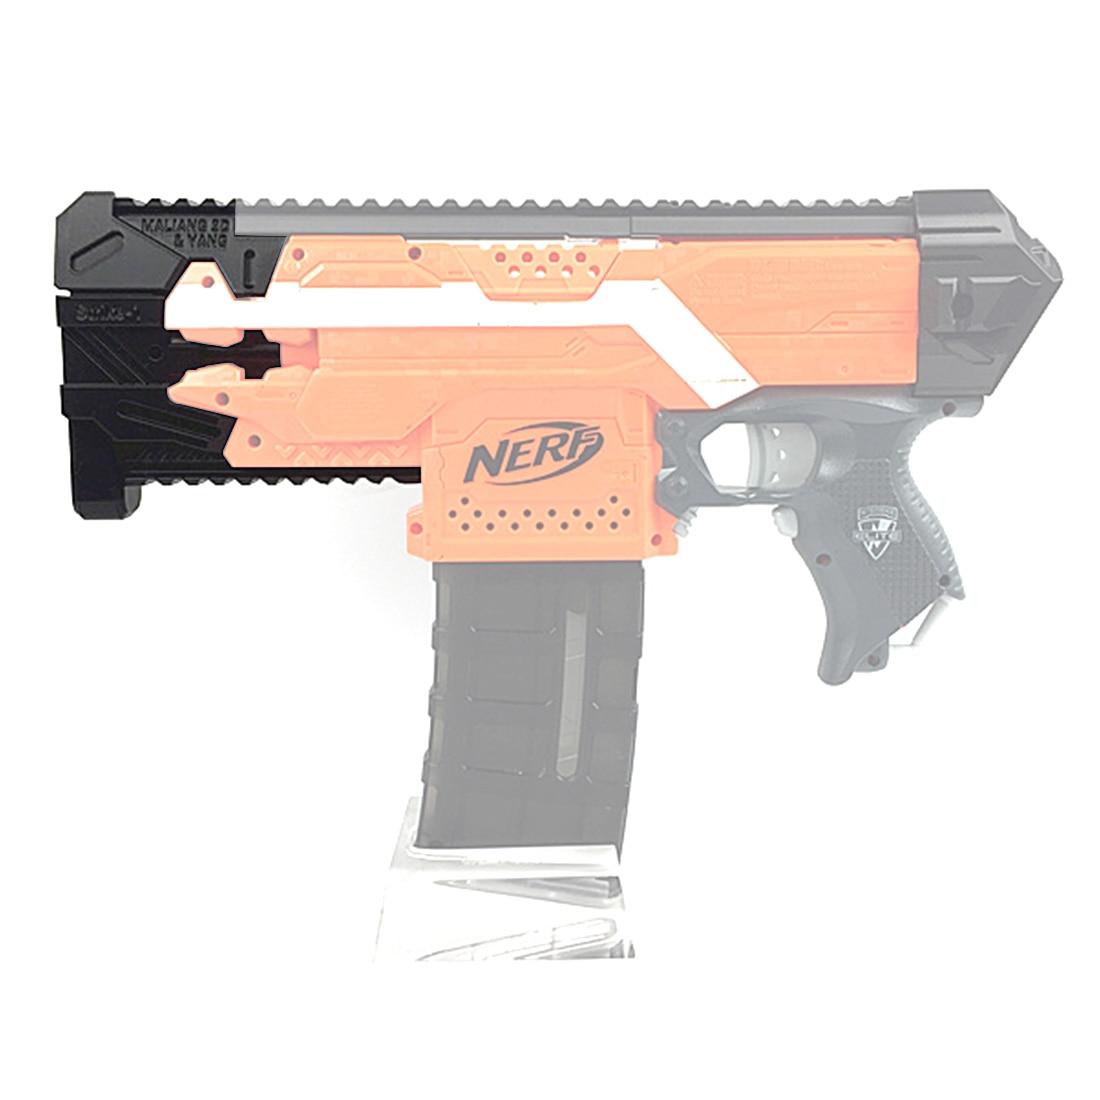 купить Maliang 3D Printing Modified Science Fiction Style S1 Front Tube for Nerf Stryfe по цене 1484.39 рублей